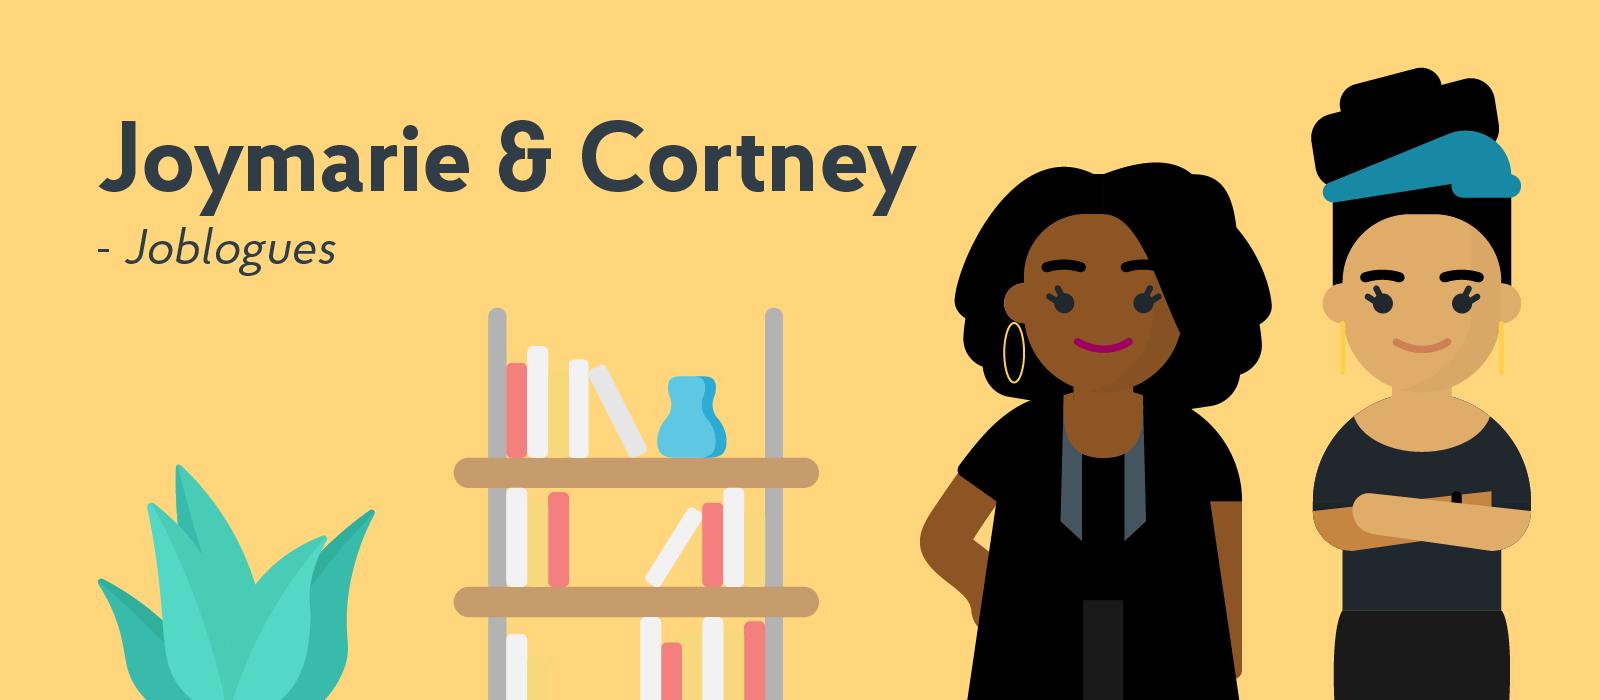 Joymarie and Cortney career influencers